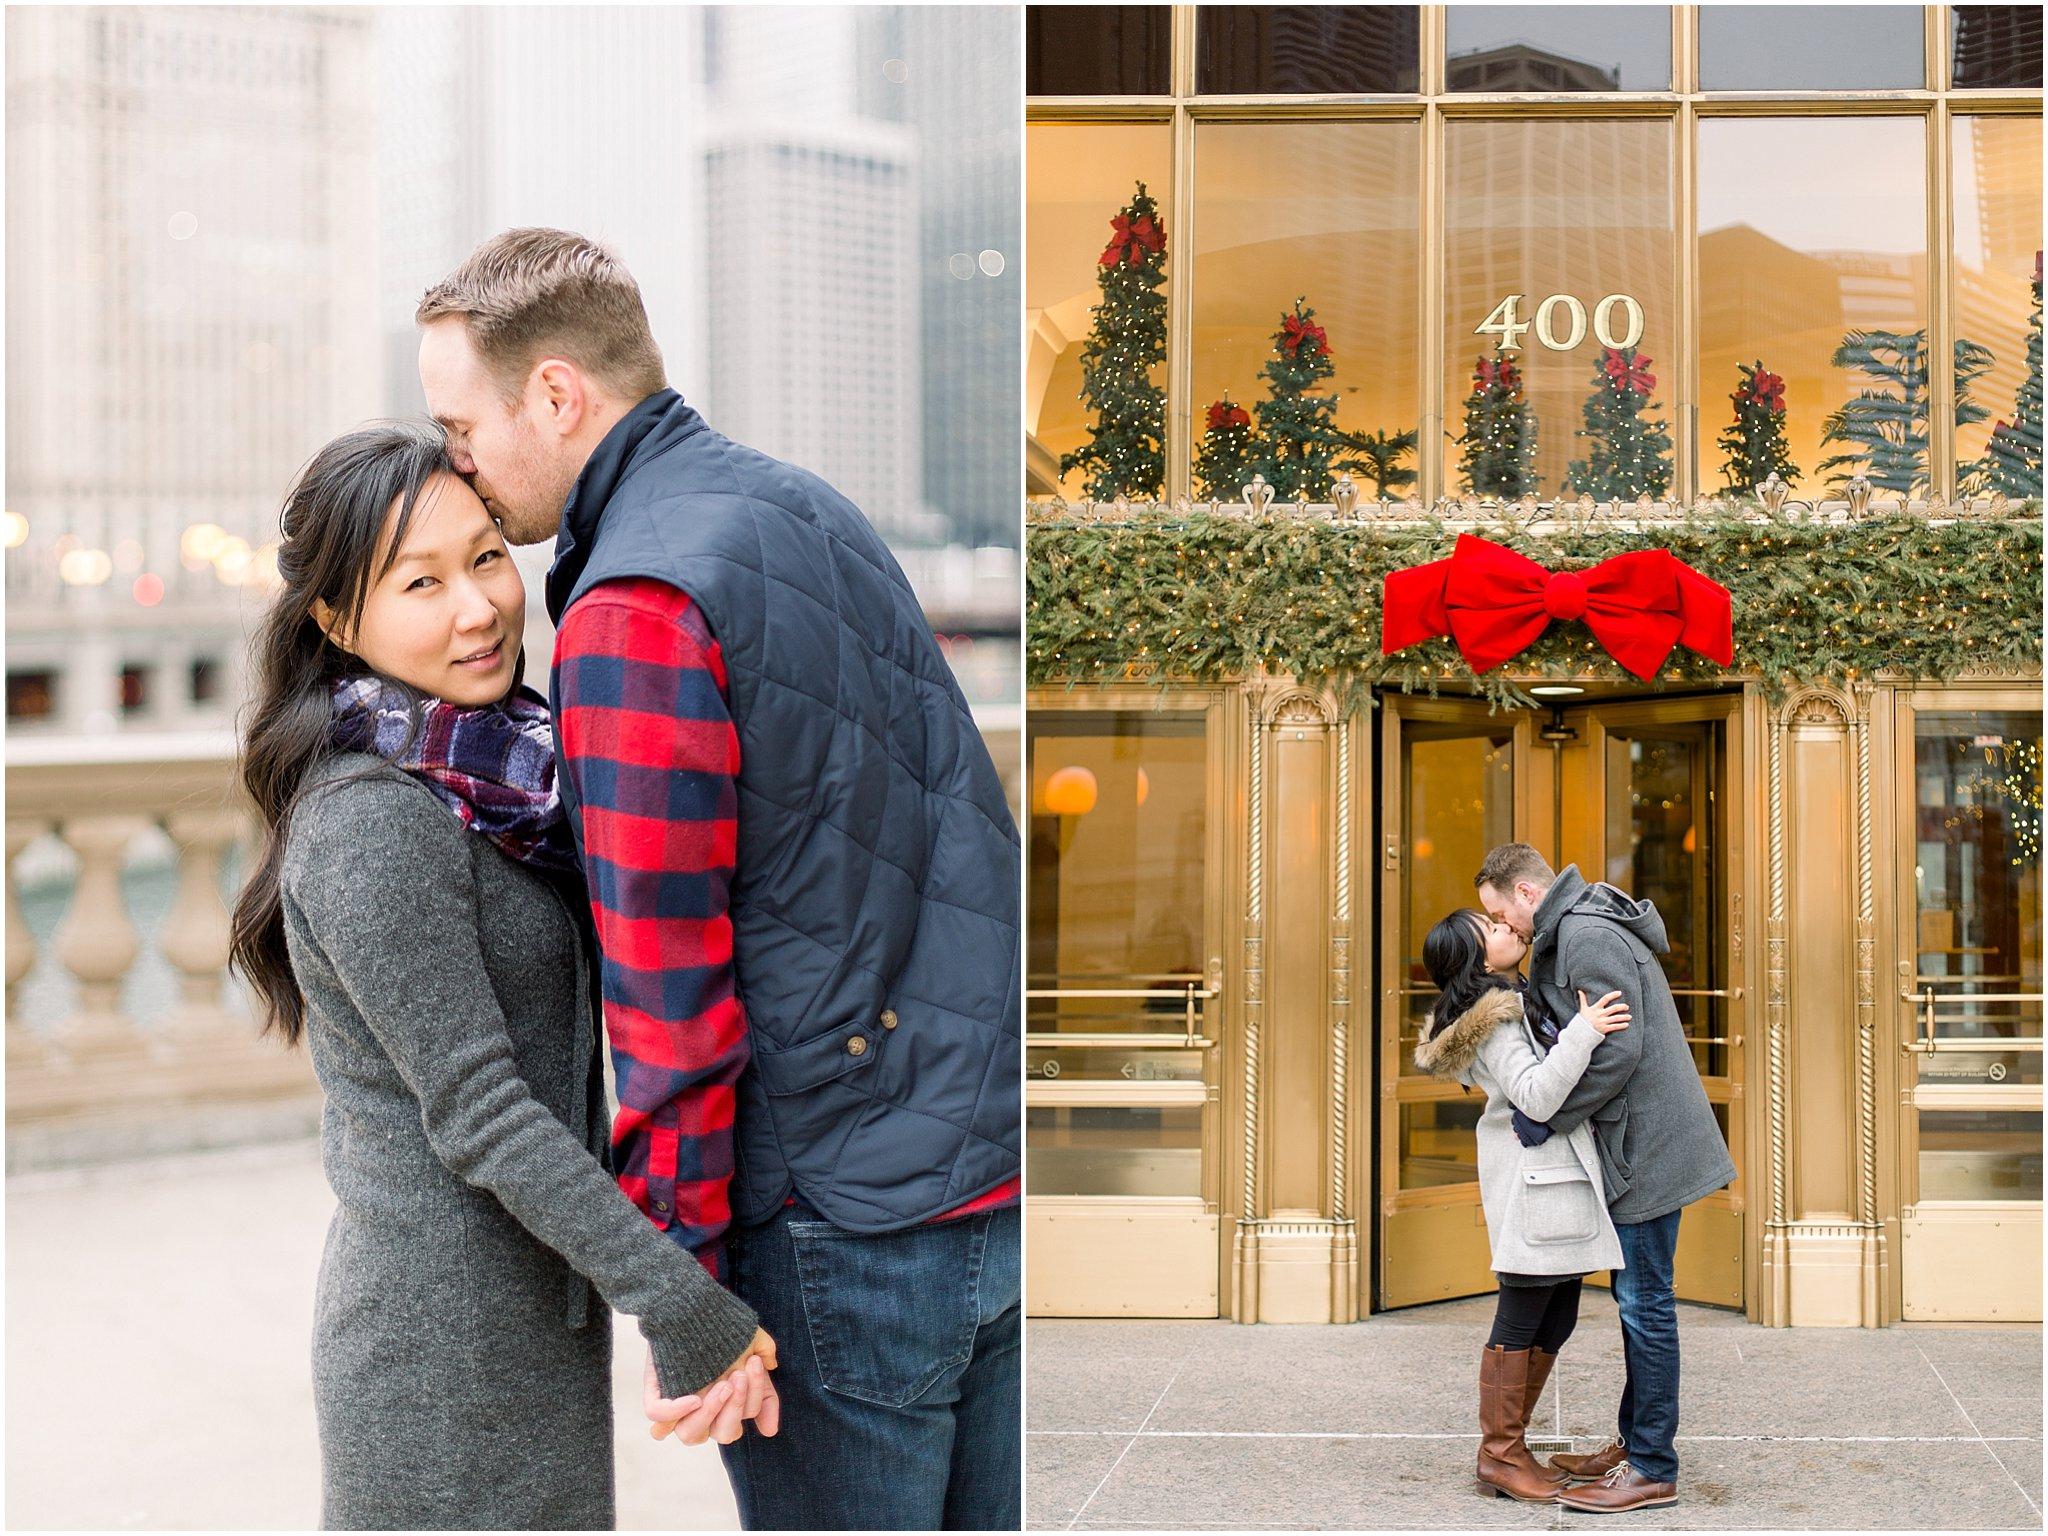 Winter-Downtown-Olive-Park-Engagement-Photographer_0008.jpg